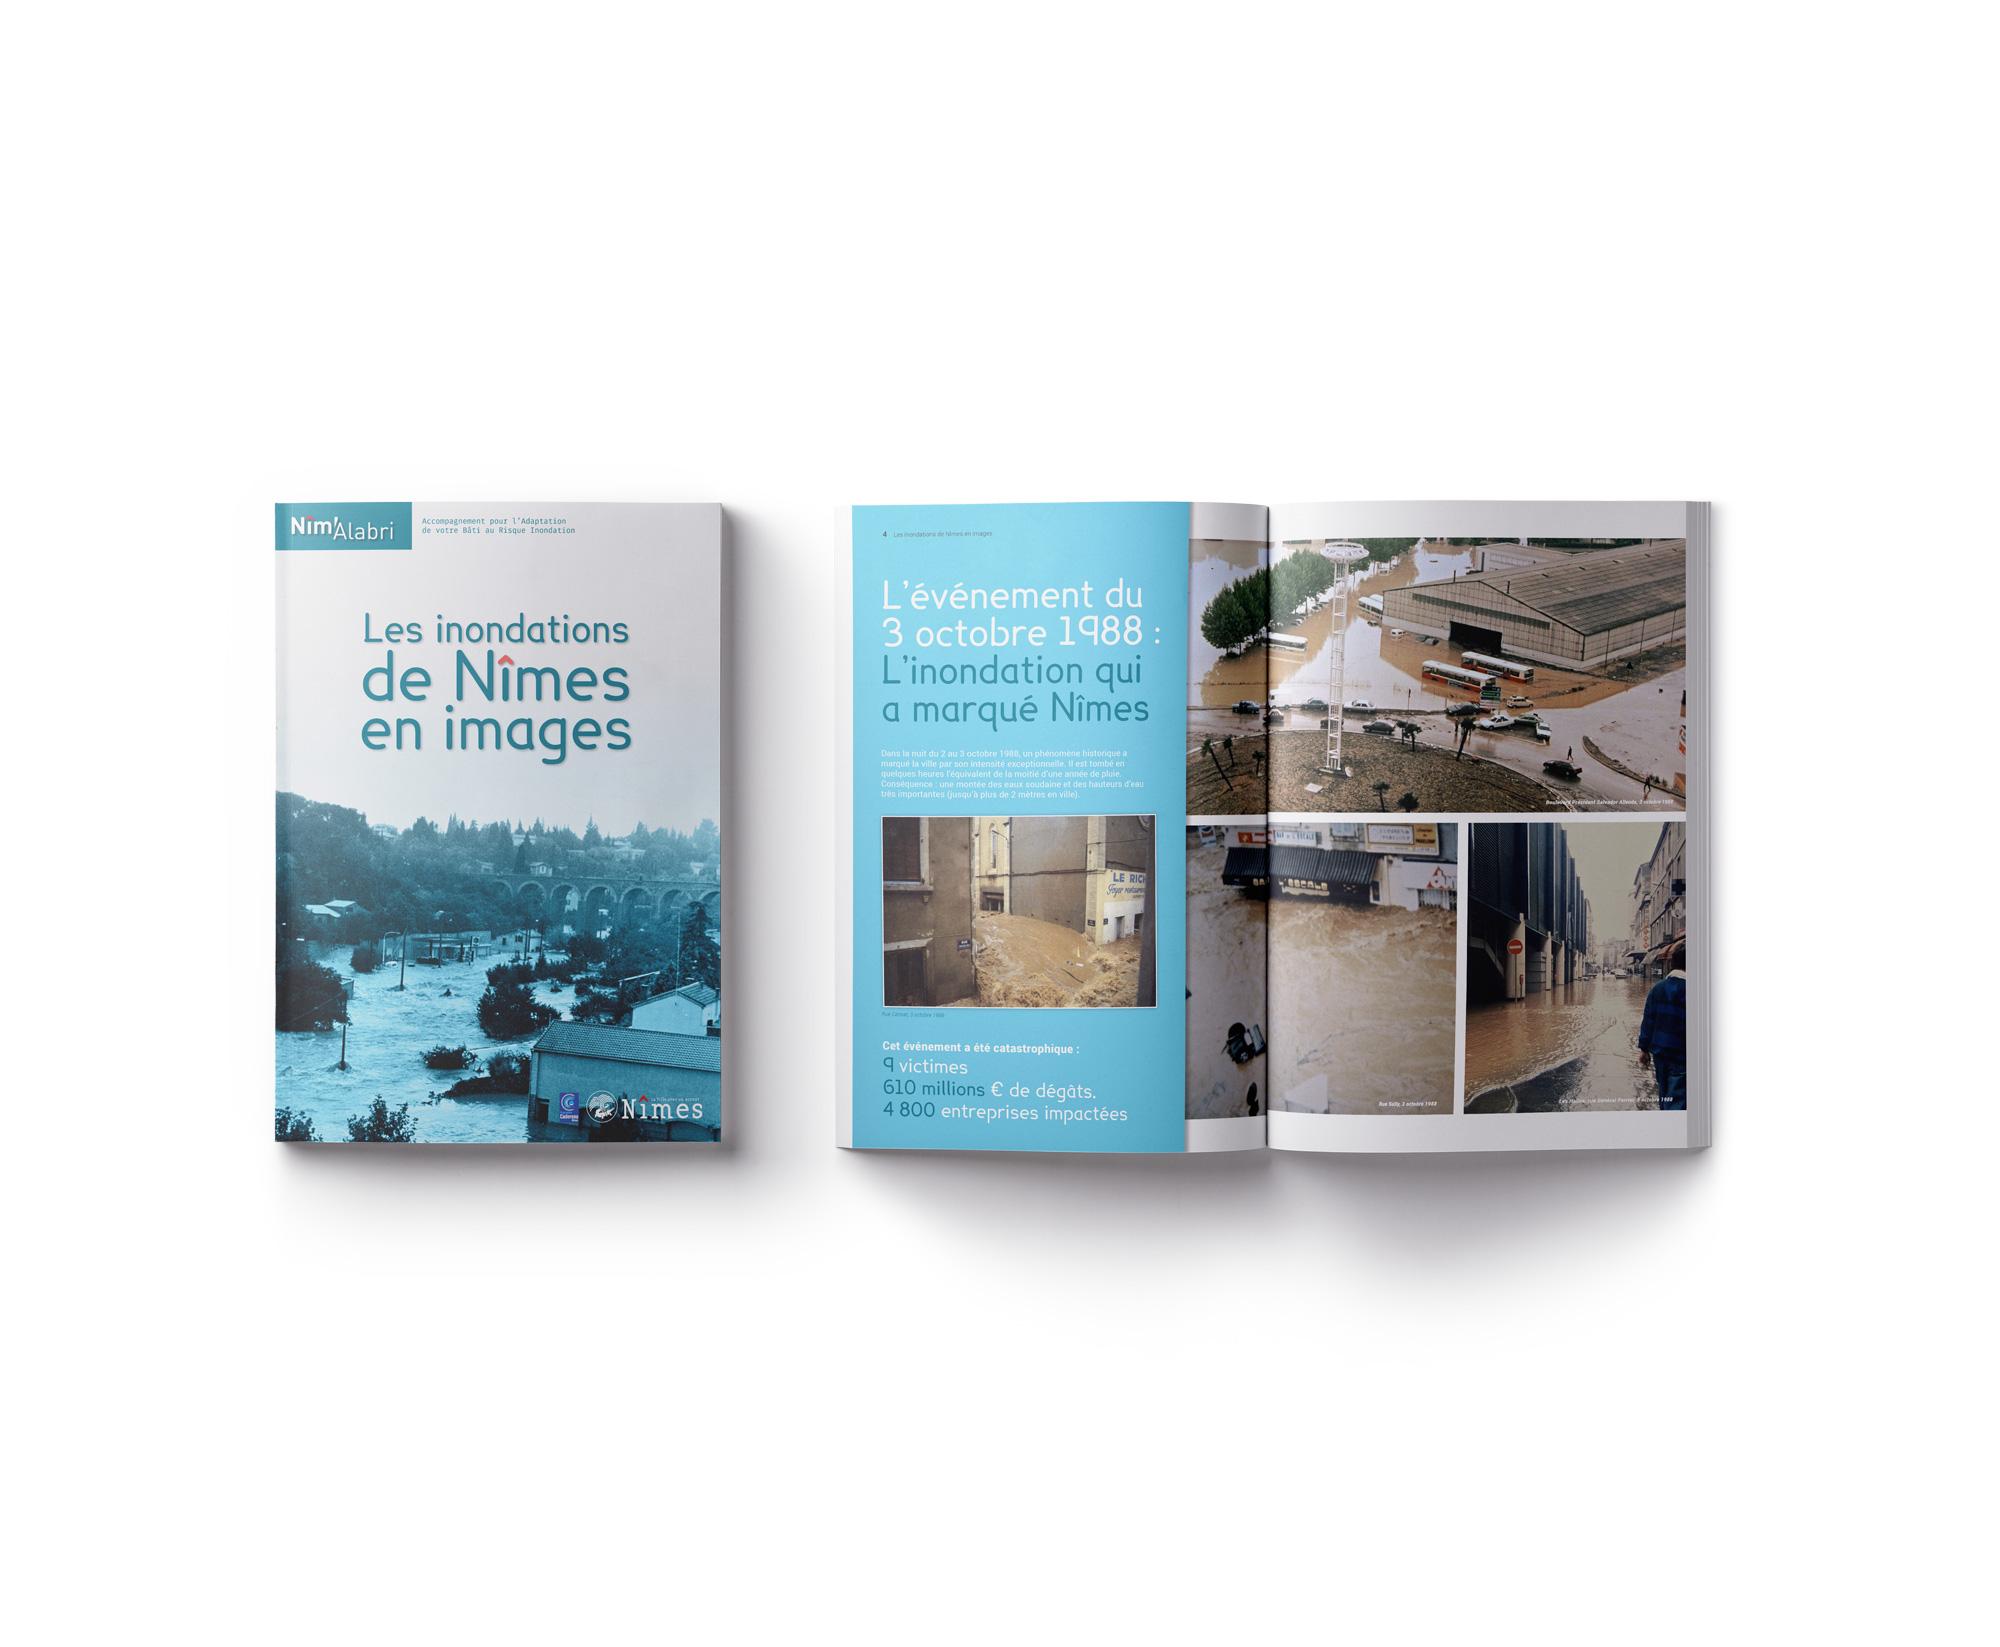 Nim'alabri Entreprises - Brochure photos © MAYANE